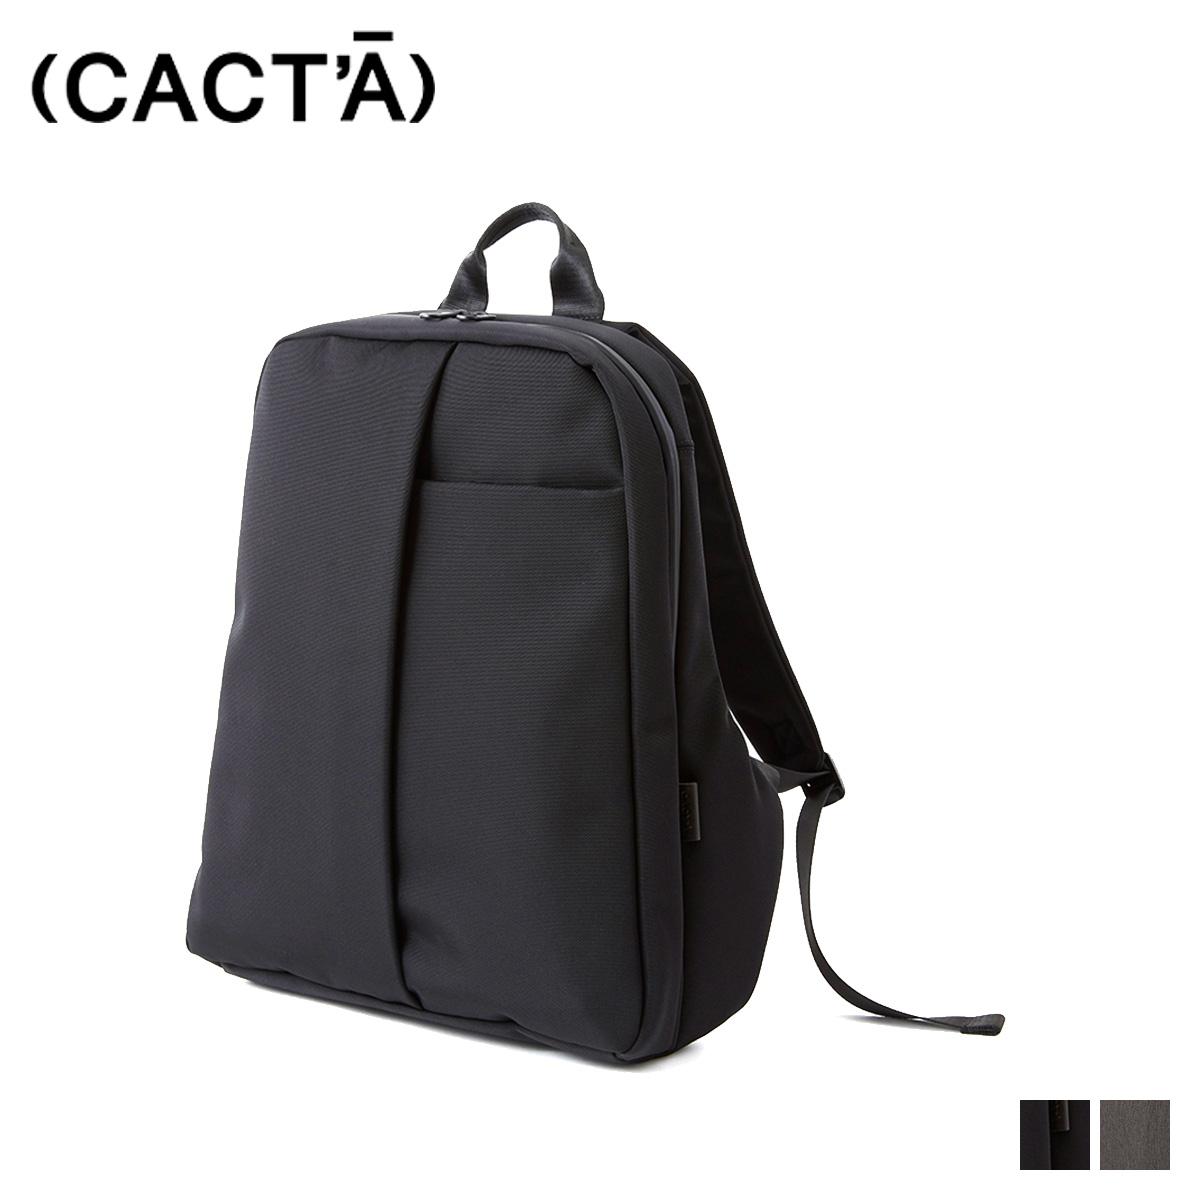 CACTA COLON BACKPACK ESPACE カクタ リュック バッグ バックパック メンズ ブラック グレー 黒 1009